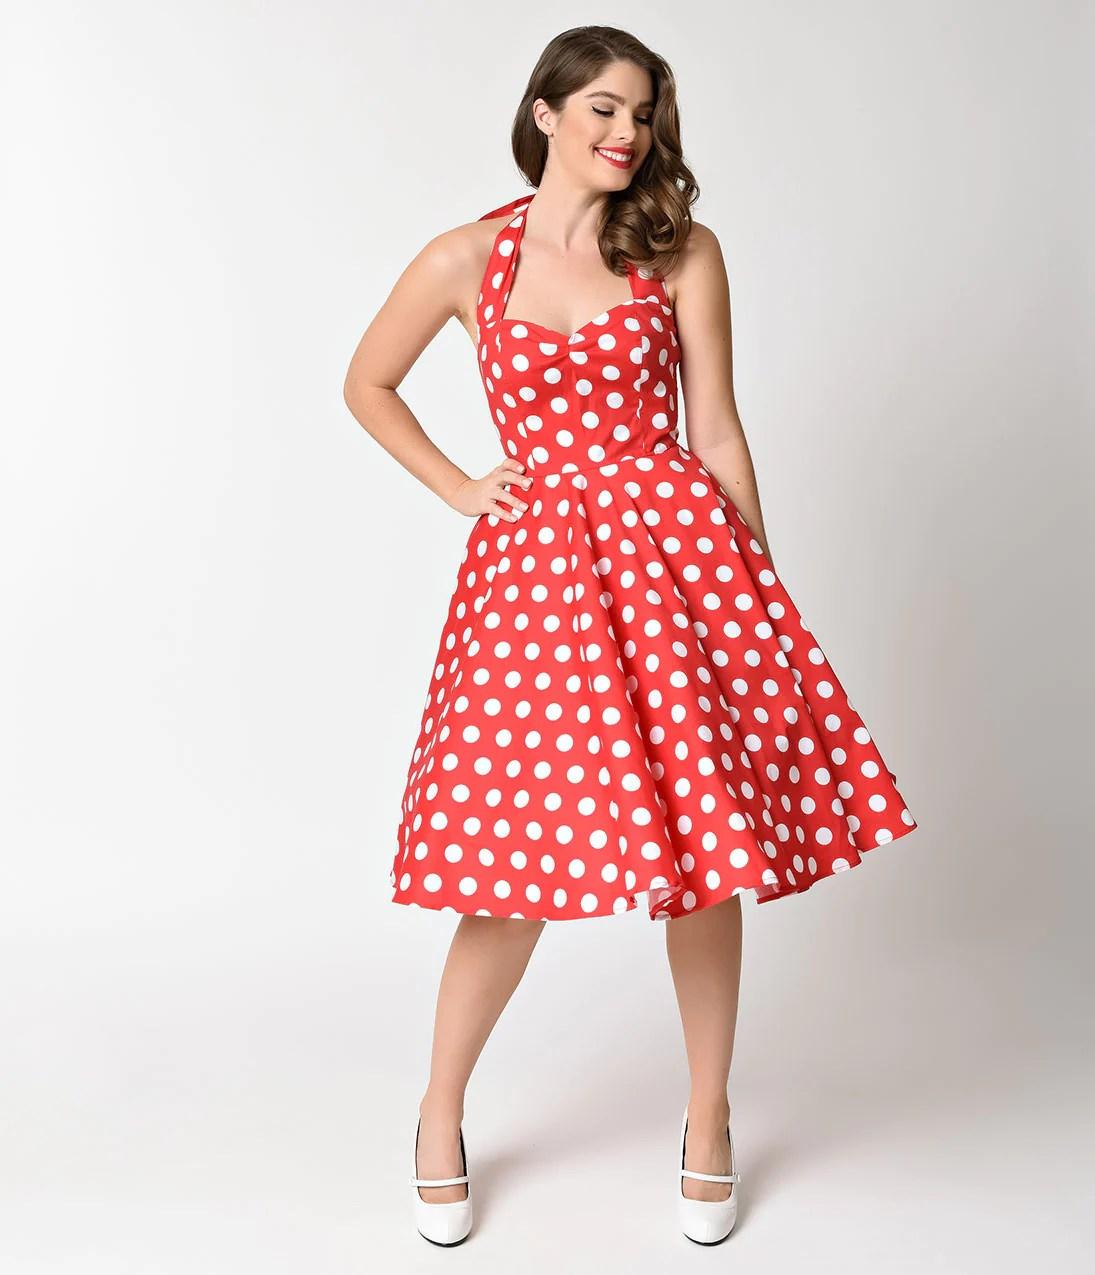 Polka Dot Halter Dress